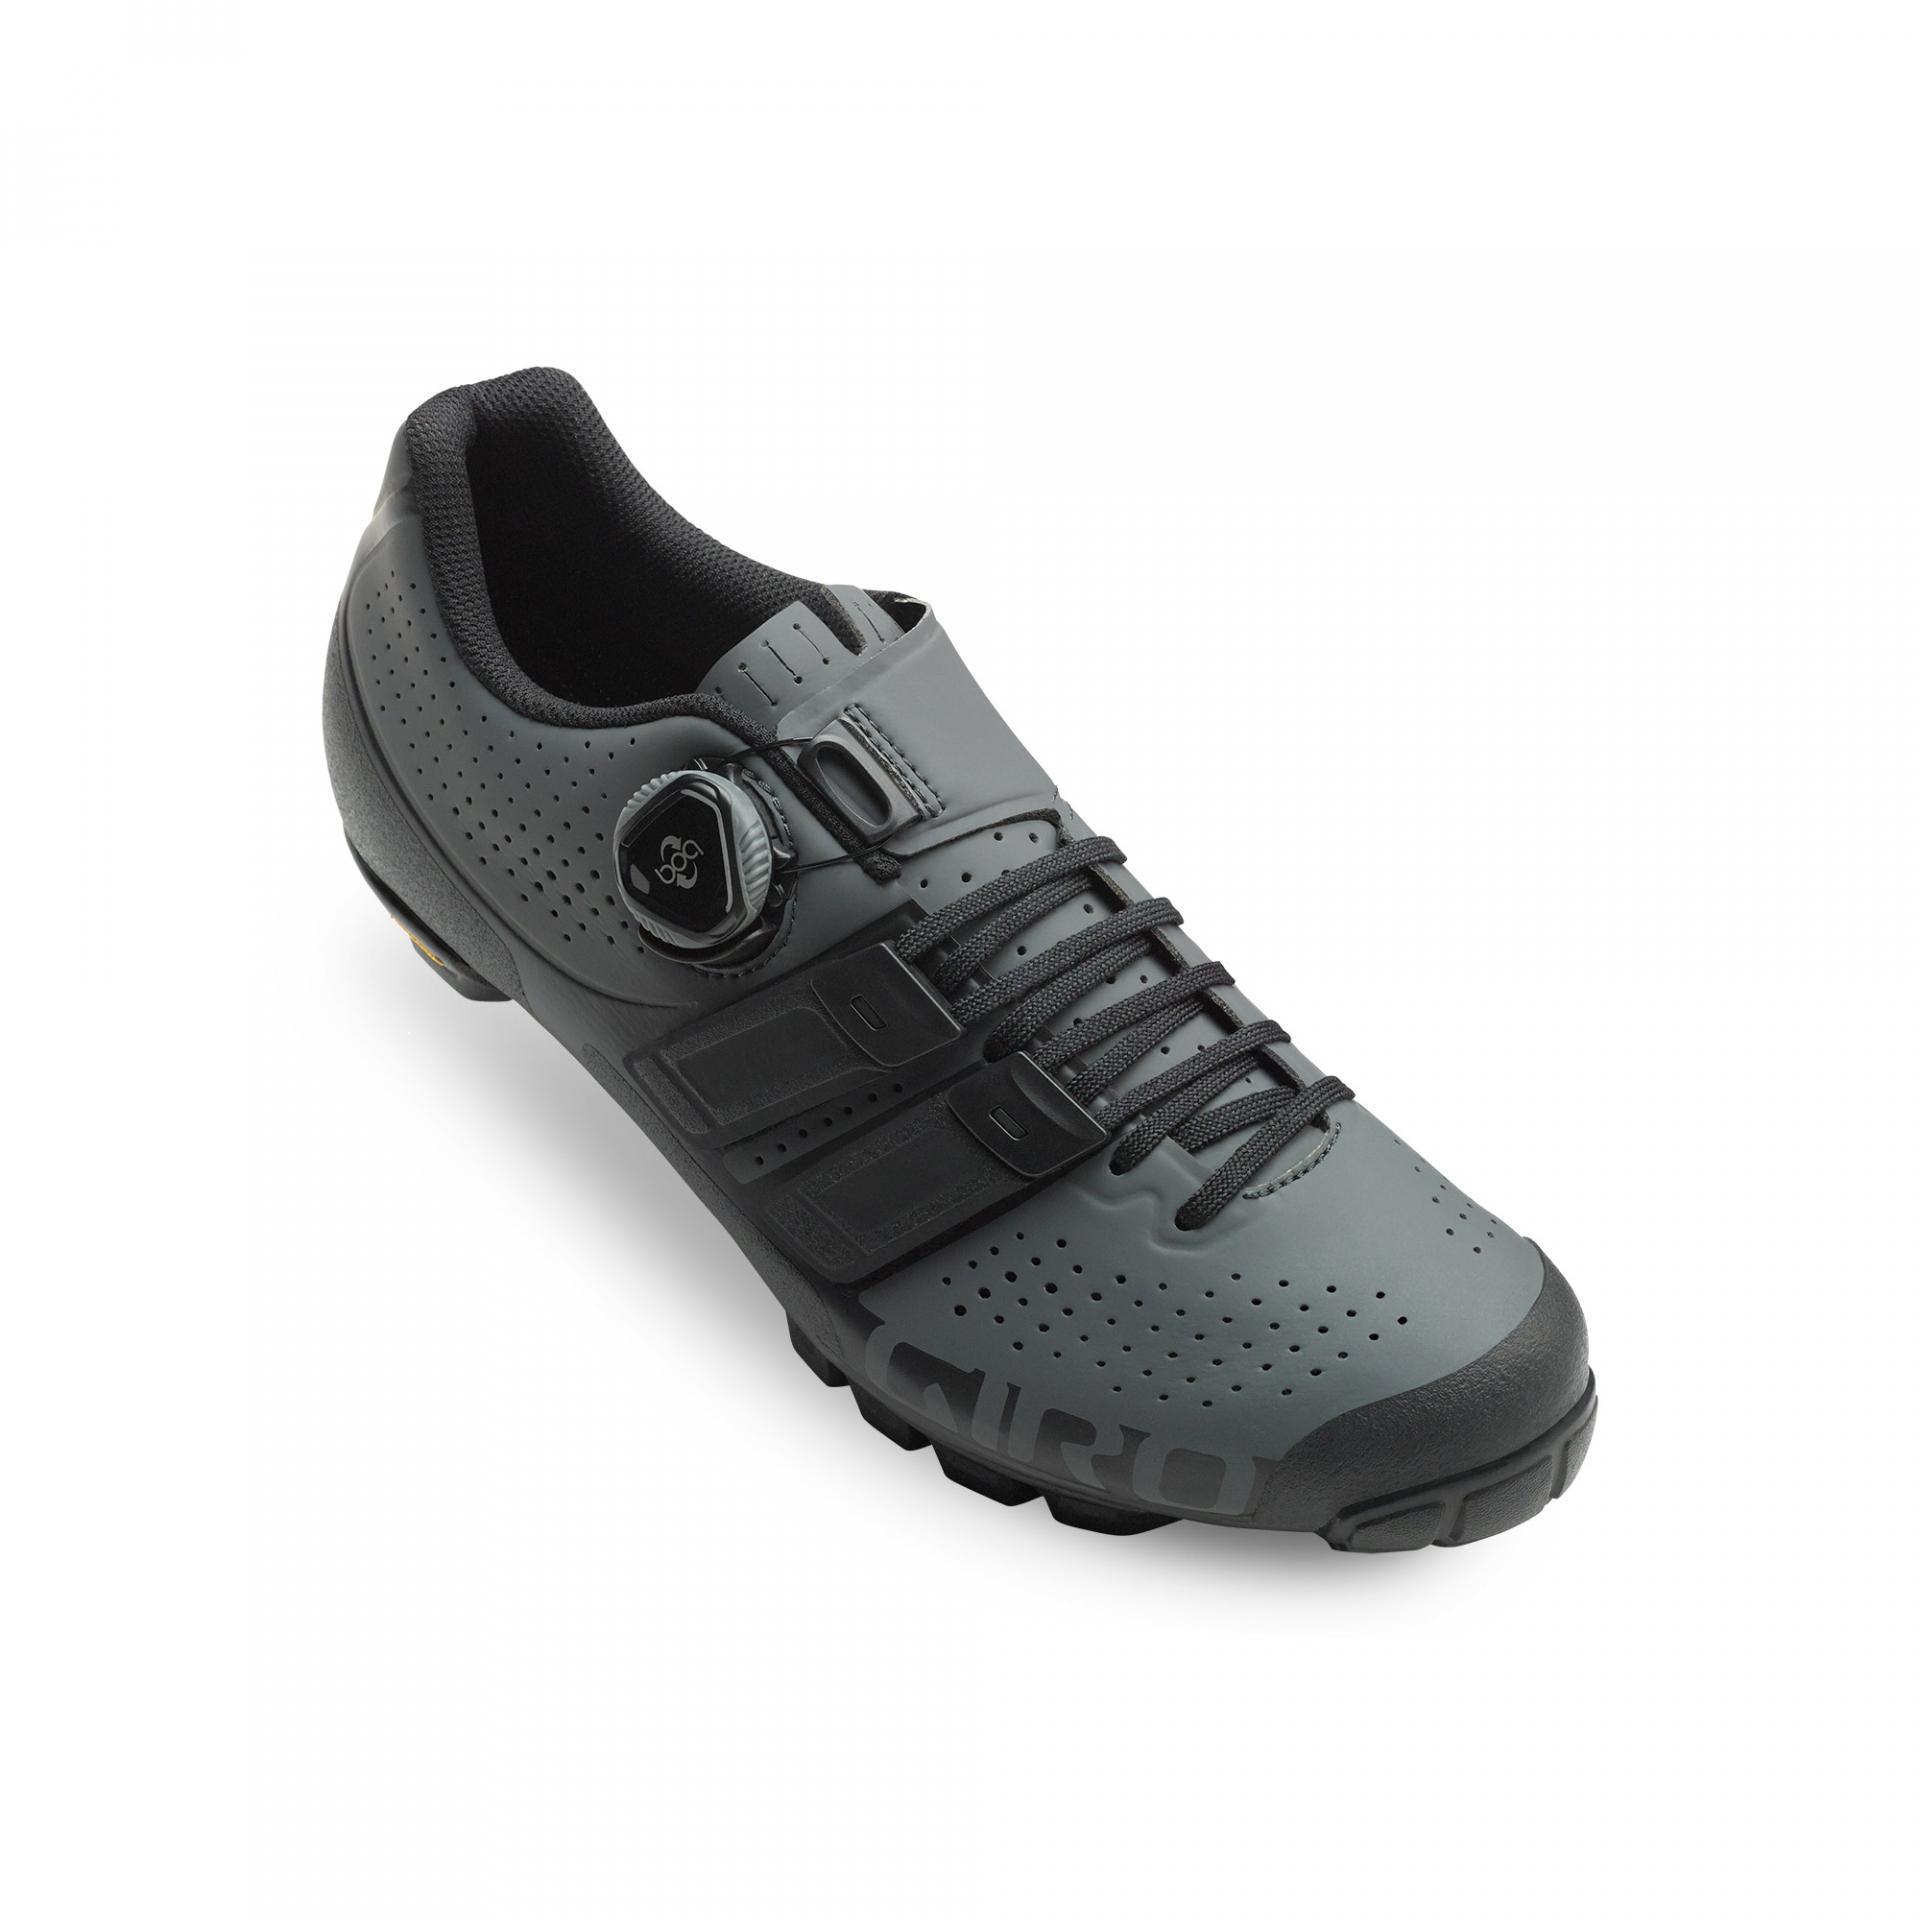 Chaussures Giro Code Techlace Dark Shadow/Noir - 41